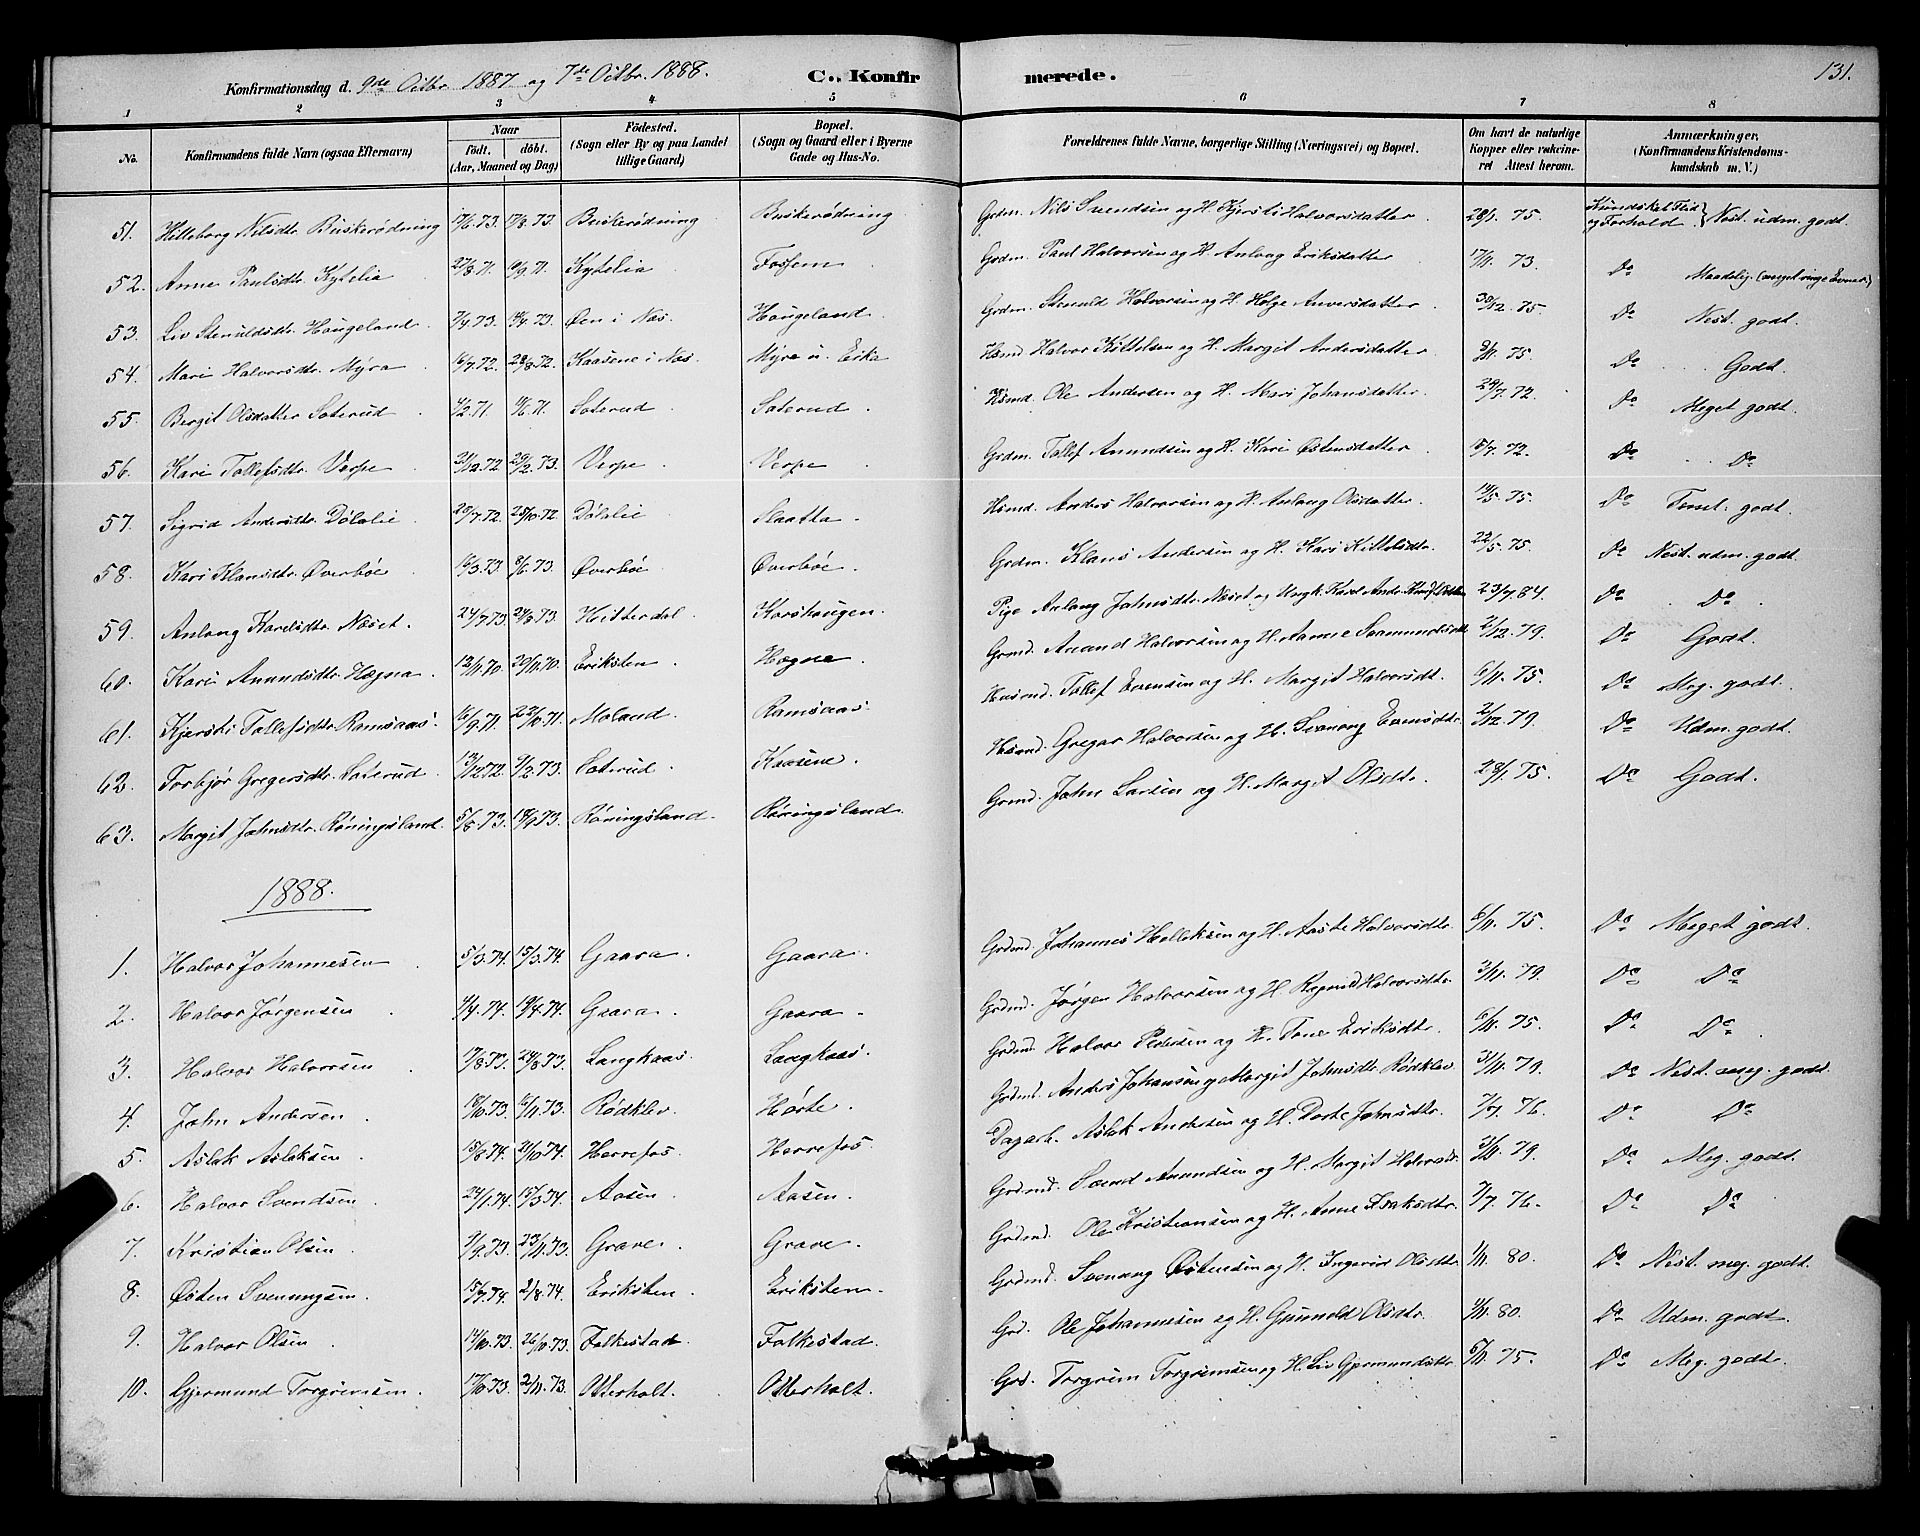 SAKO, Bø kirkebøker, G/Ga/L0005: Klokkerbok nr. 5, 1883-1897, s. 131